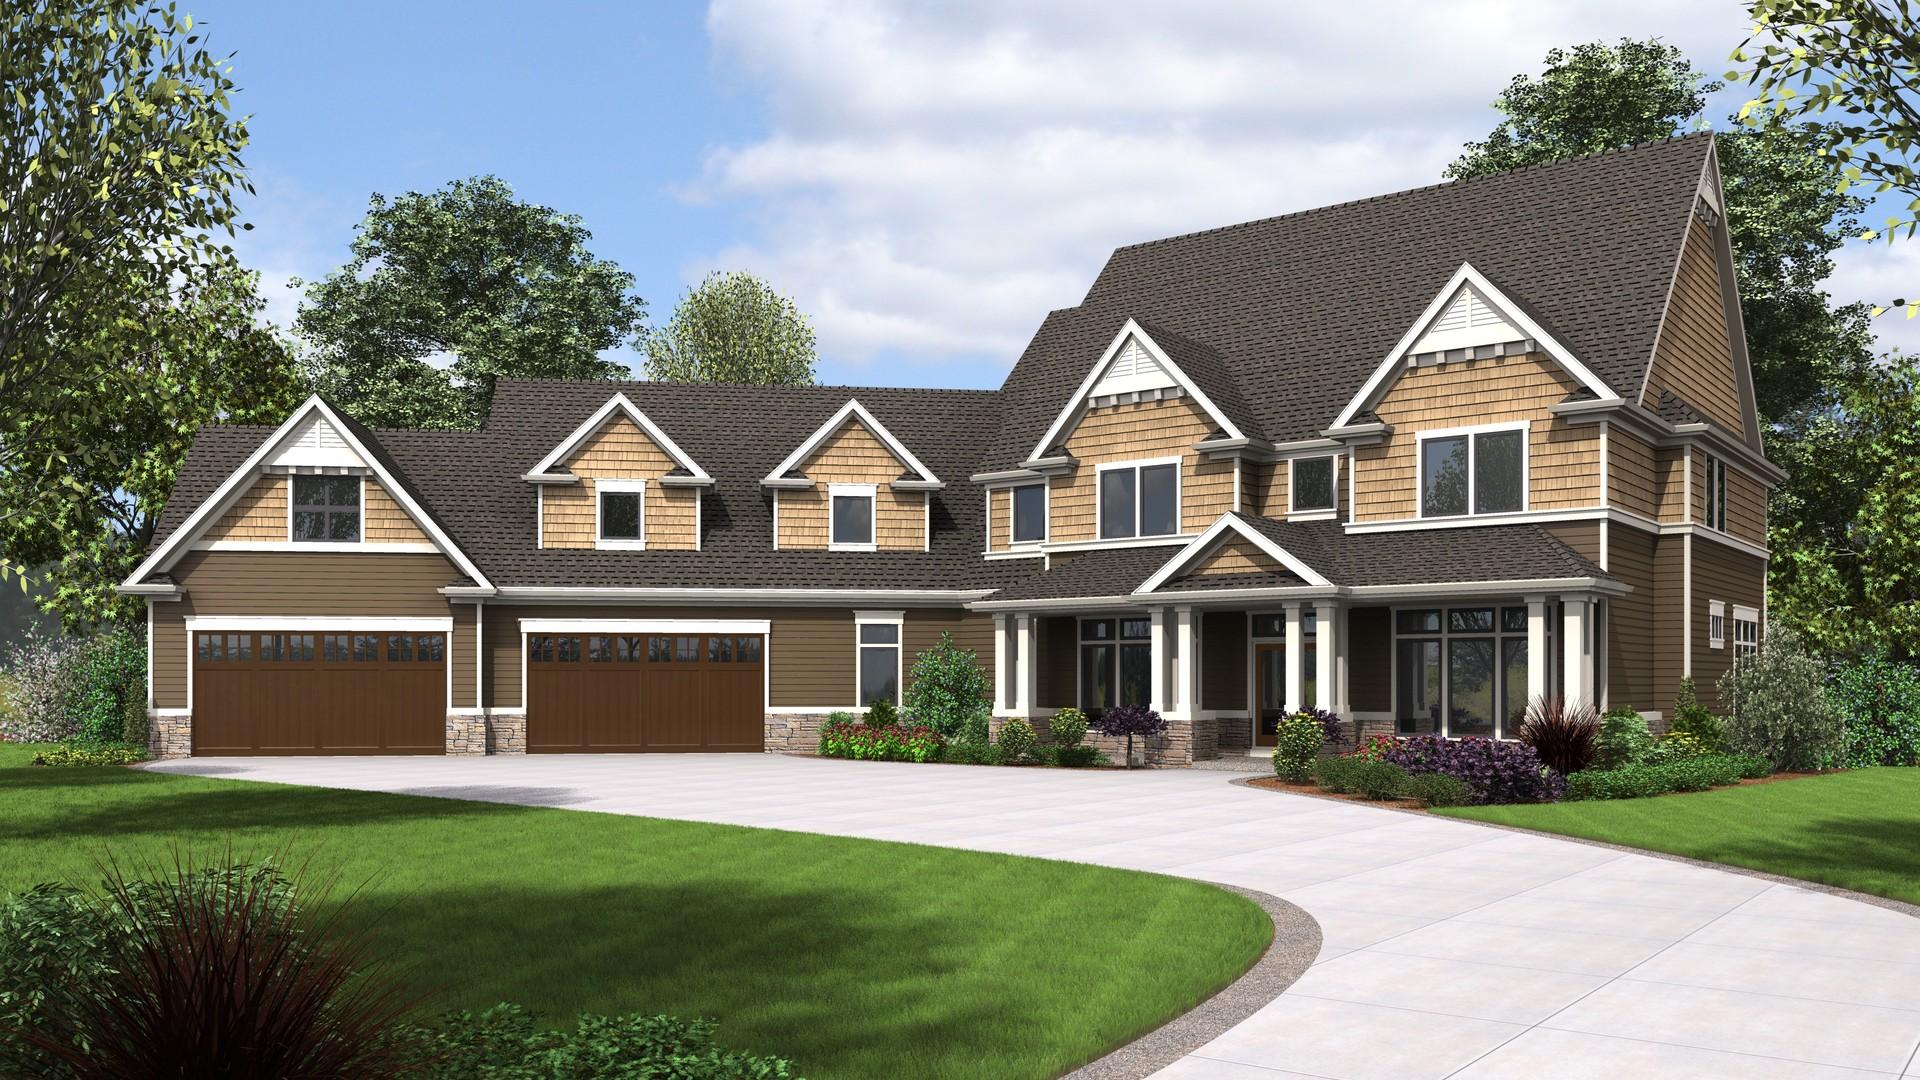 Craftsman House Plan 2474 The Morristown 6349 Sqft 5